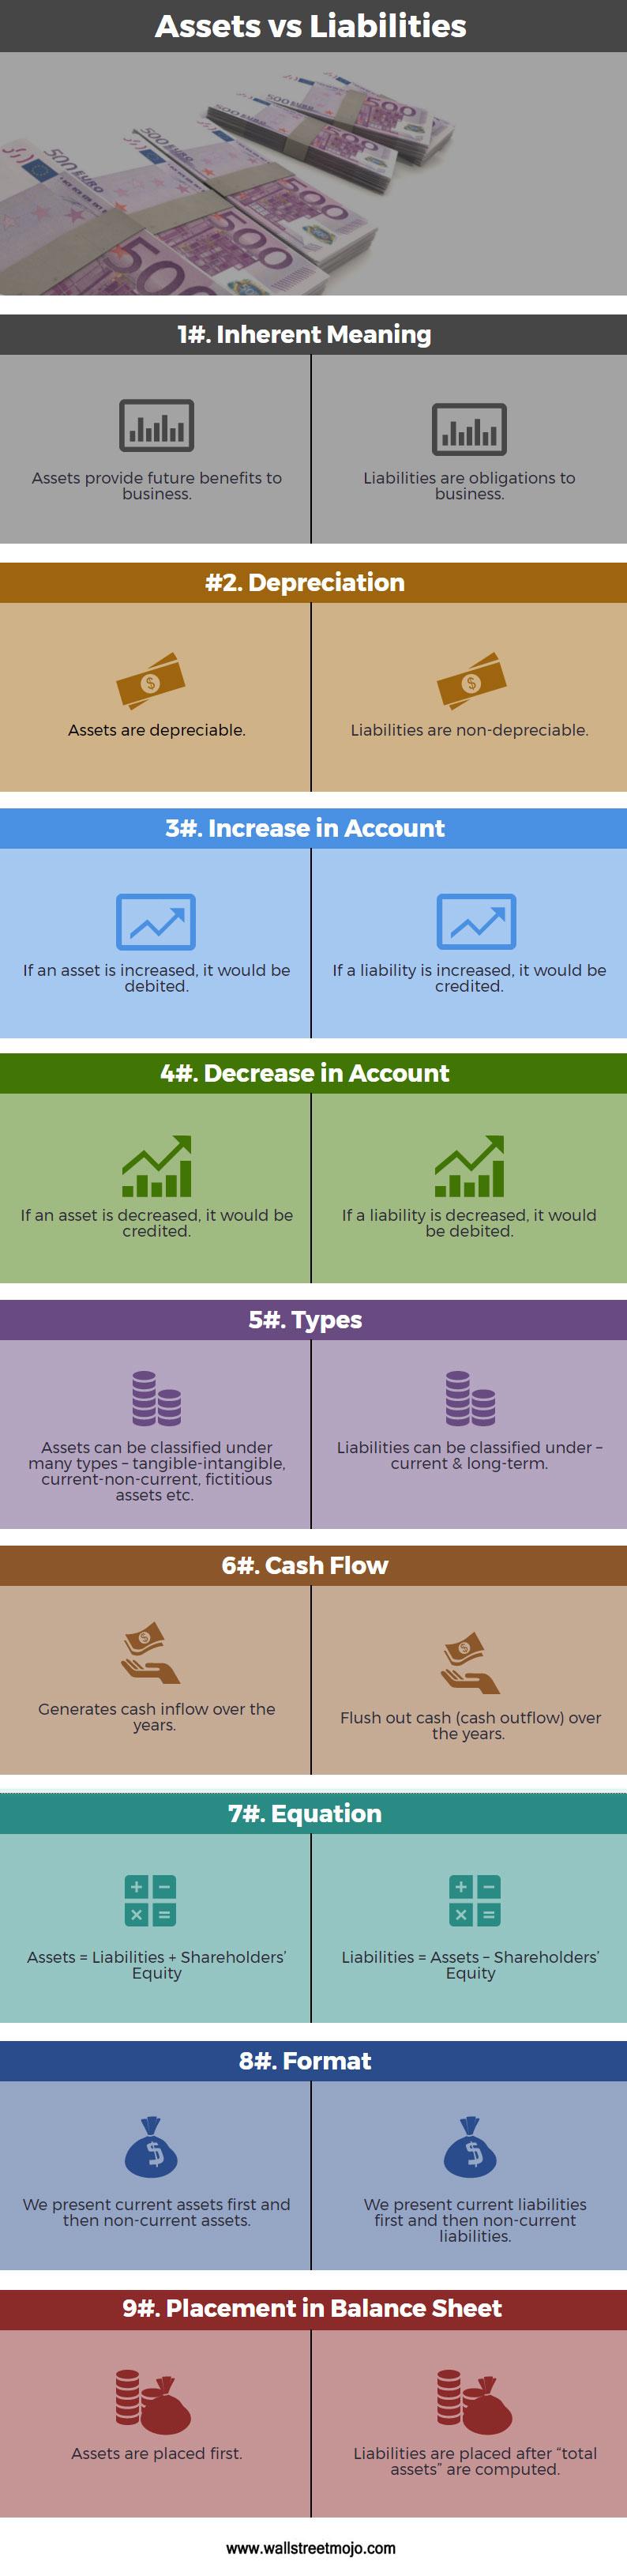 assets vs liabilities grow financially